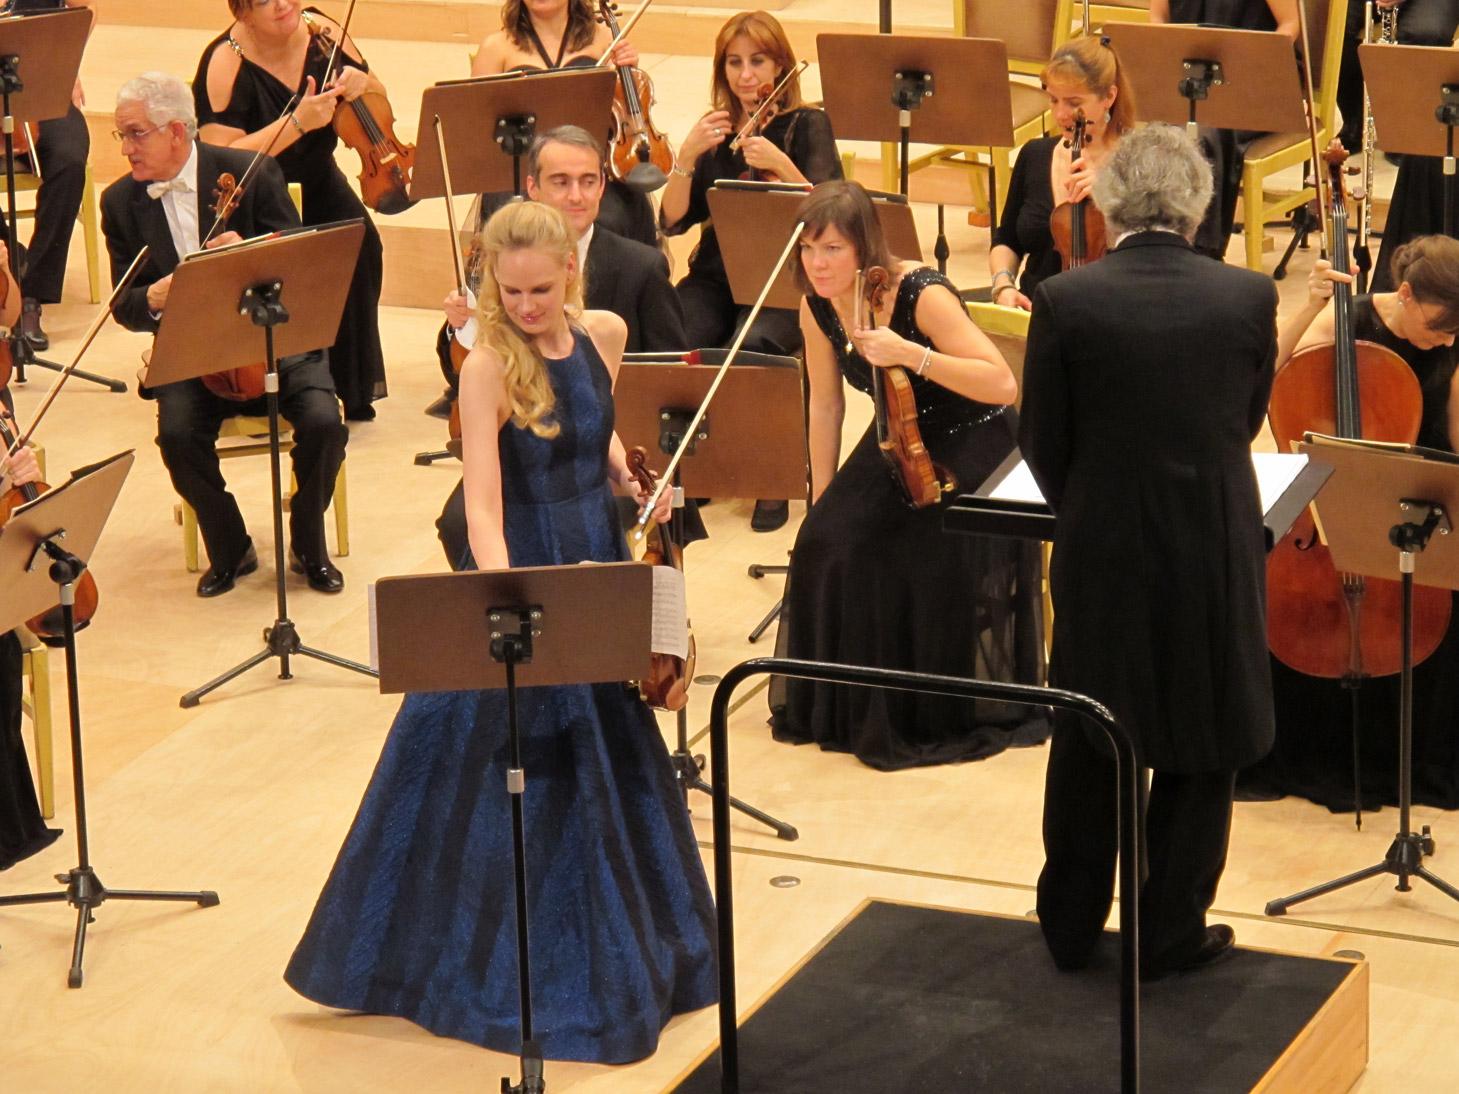 2014 - Spain, Madrid Orquesta Sinfónica de RTVE, Carlos Kalmar